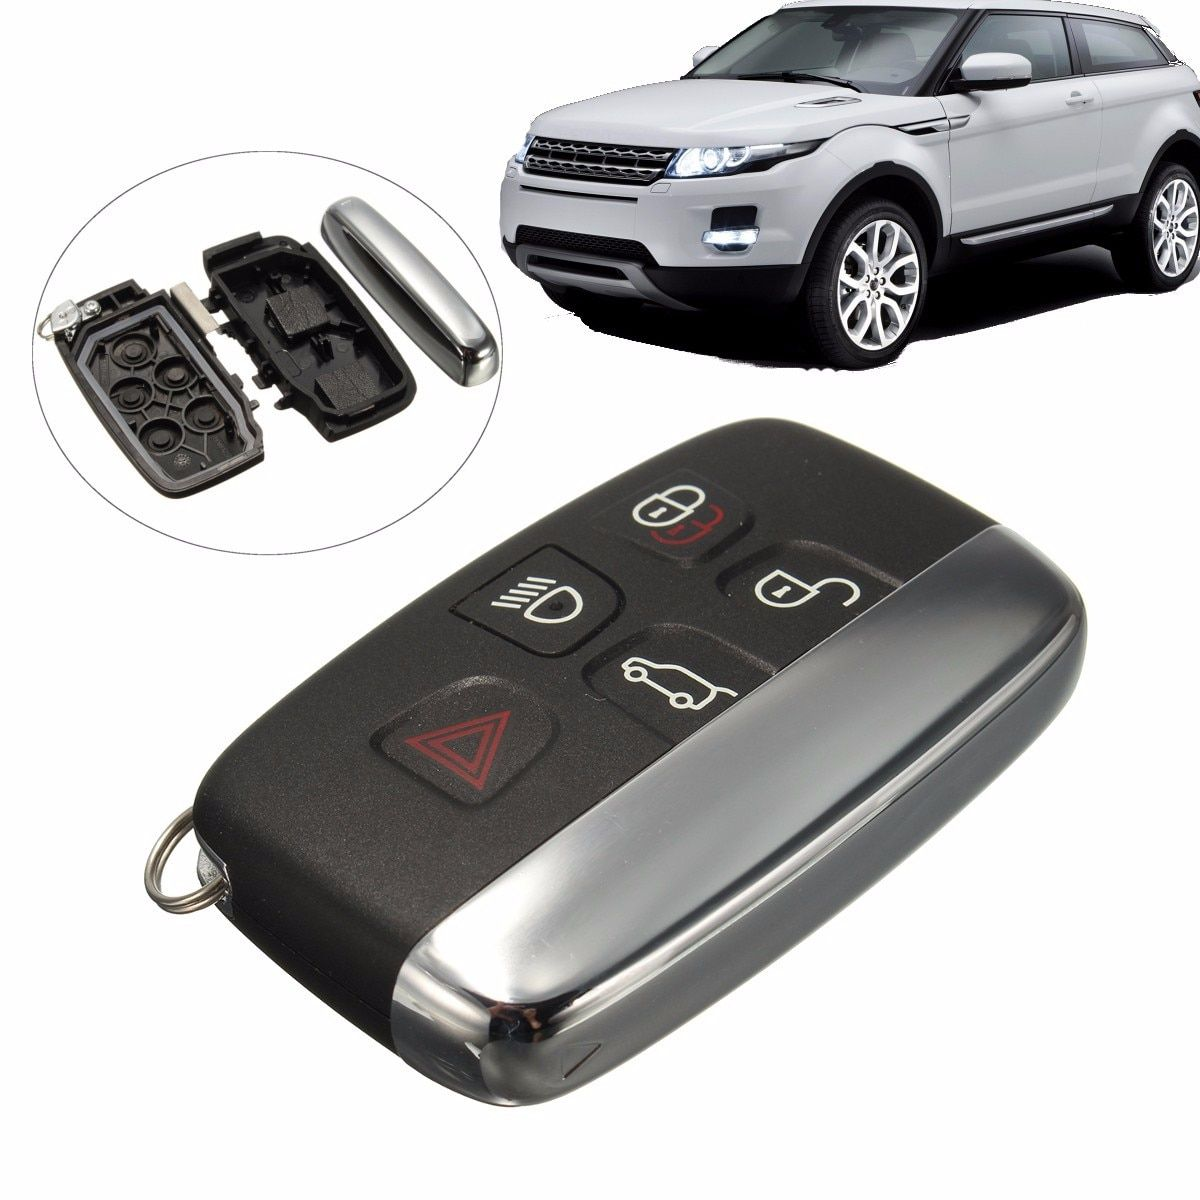 5 Button Remote FOB Key Case Cover Shell For LAND ROVER LR4 Range Rover Sport Evoque